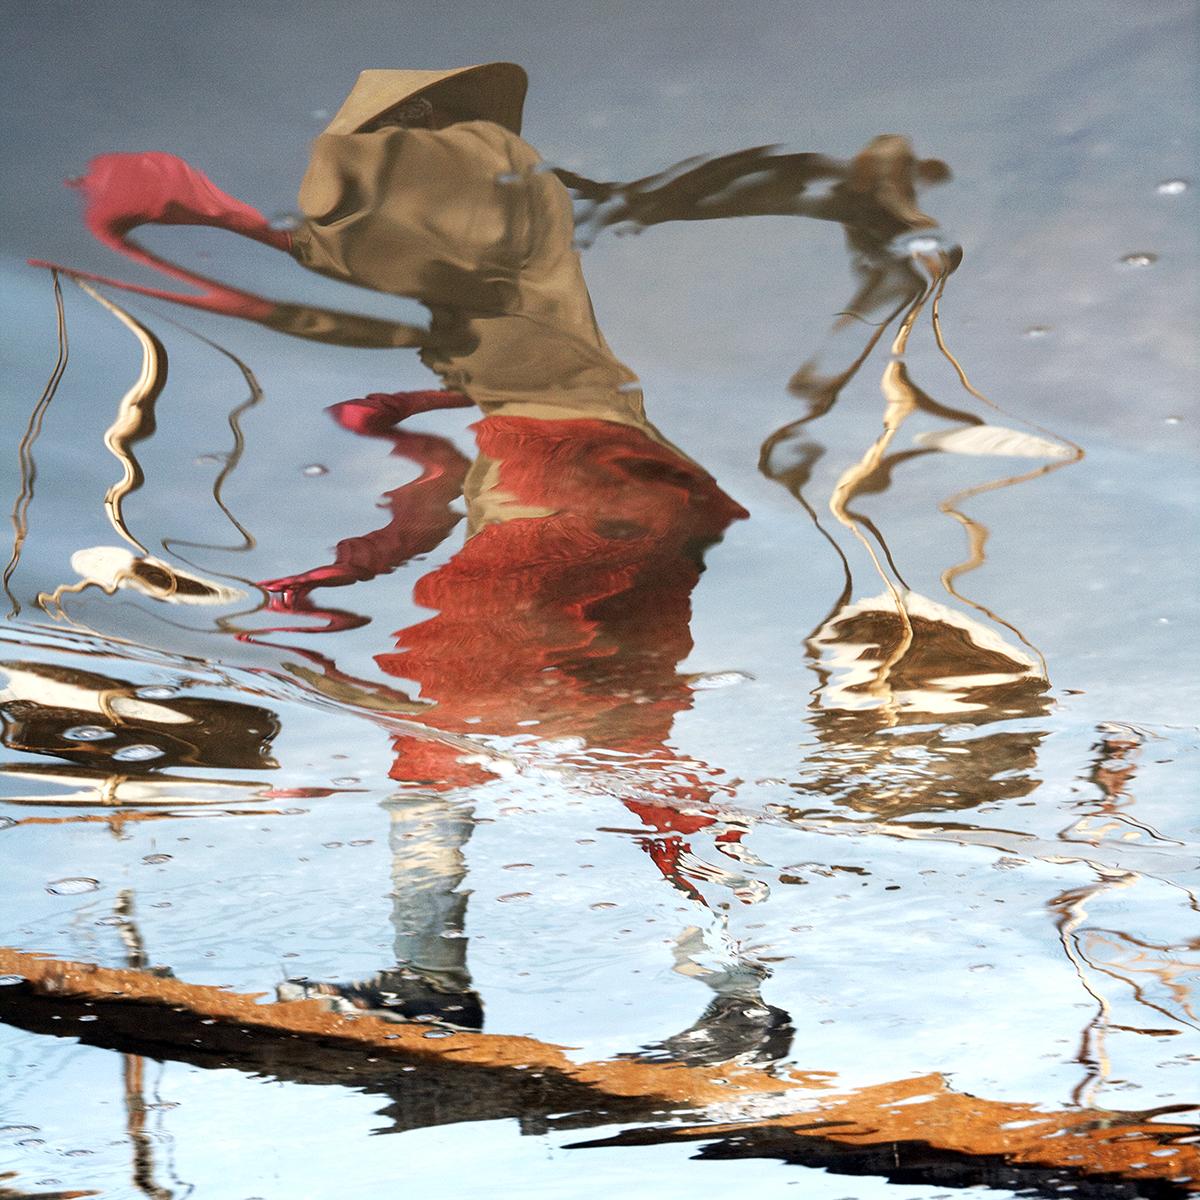 LilyPhan_ShadowsNReflections_WaterPuppet.jpg